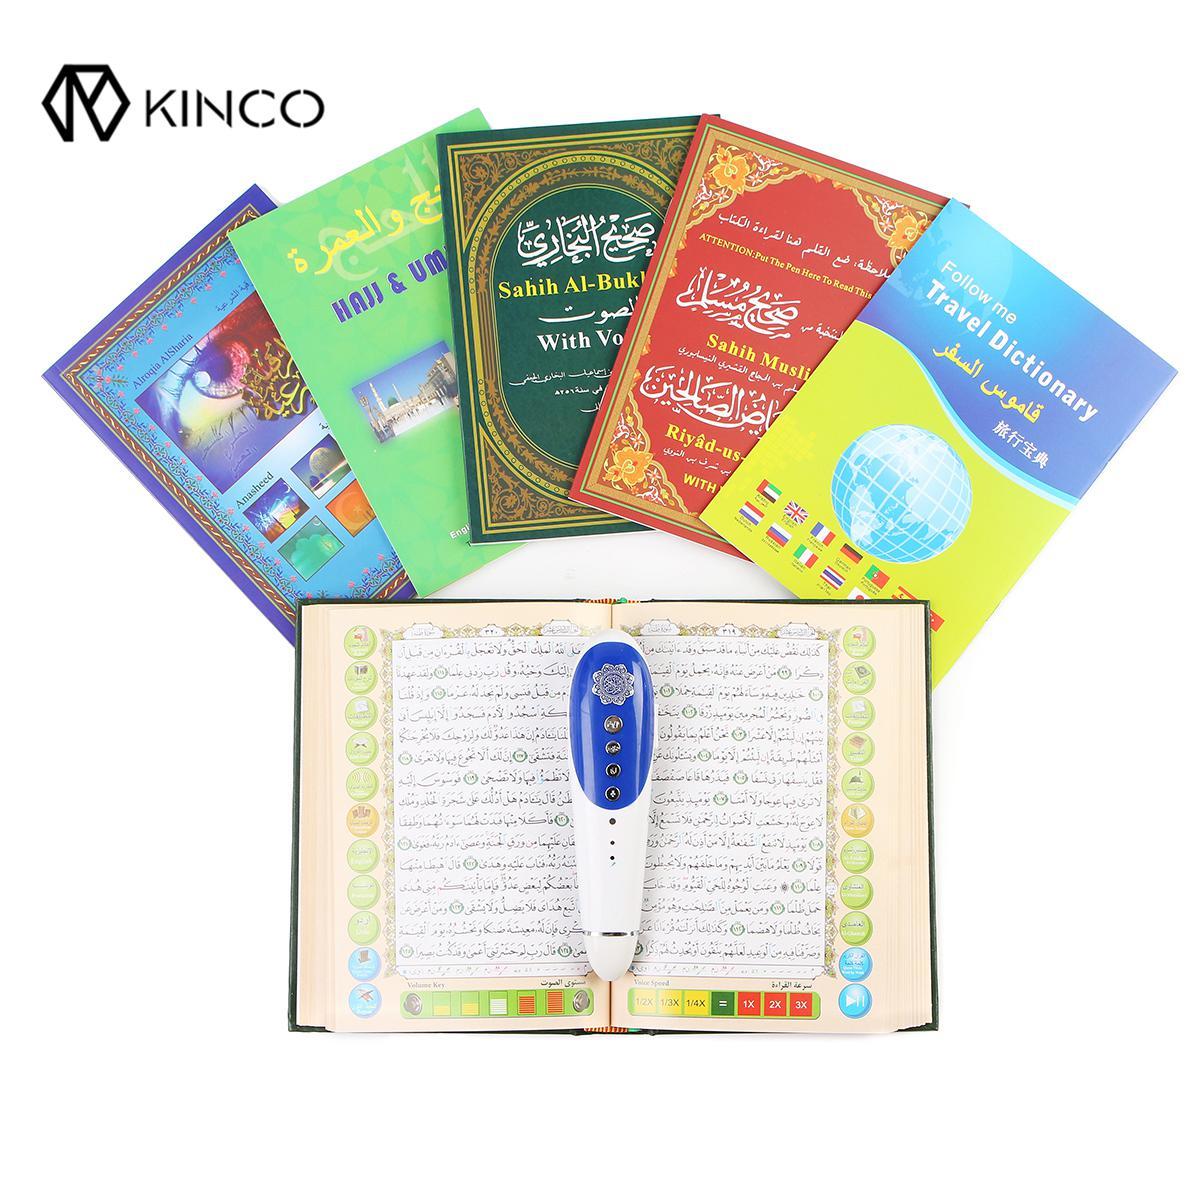 NEW 8GB Digital Quran Pen Reader 23 Languages Digital Quran Reader Pen Speaker Recite FM MP3 TF With 6 Bos